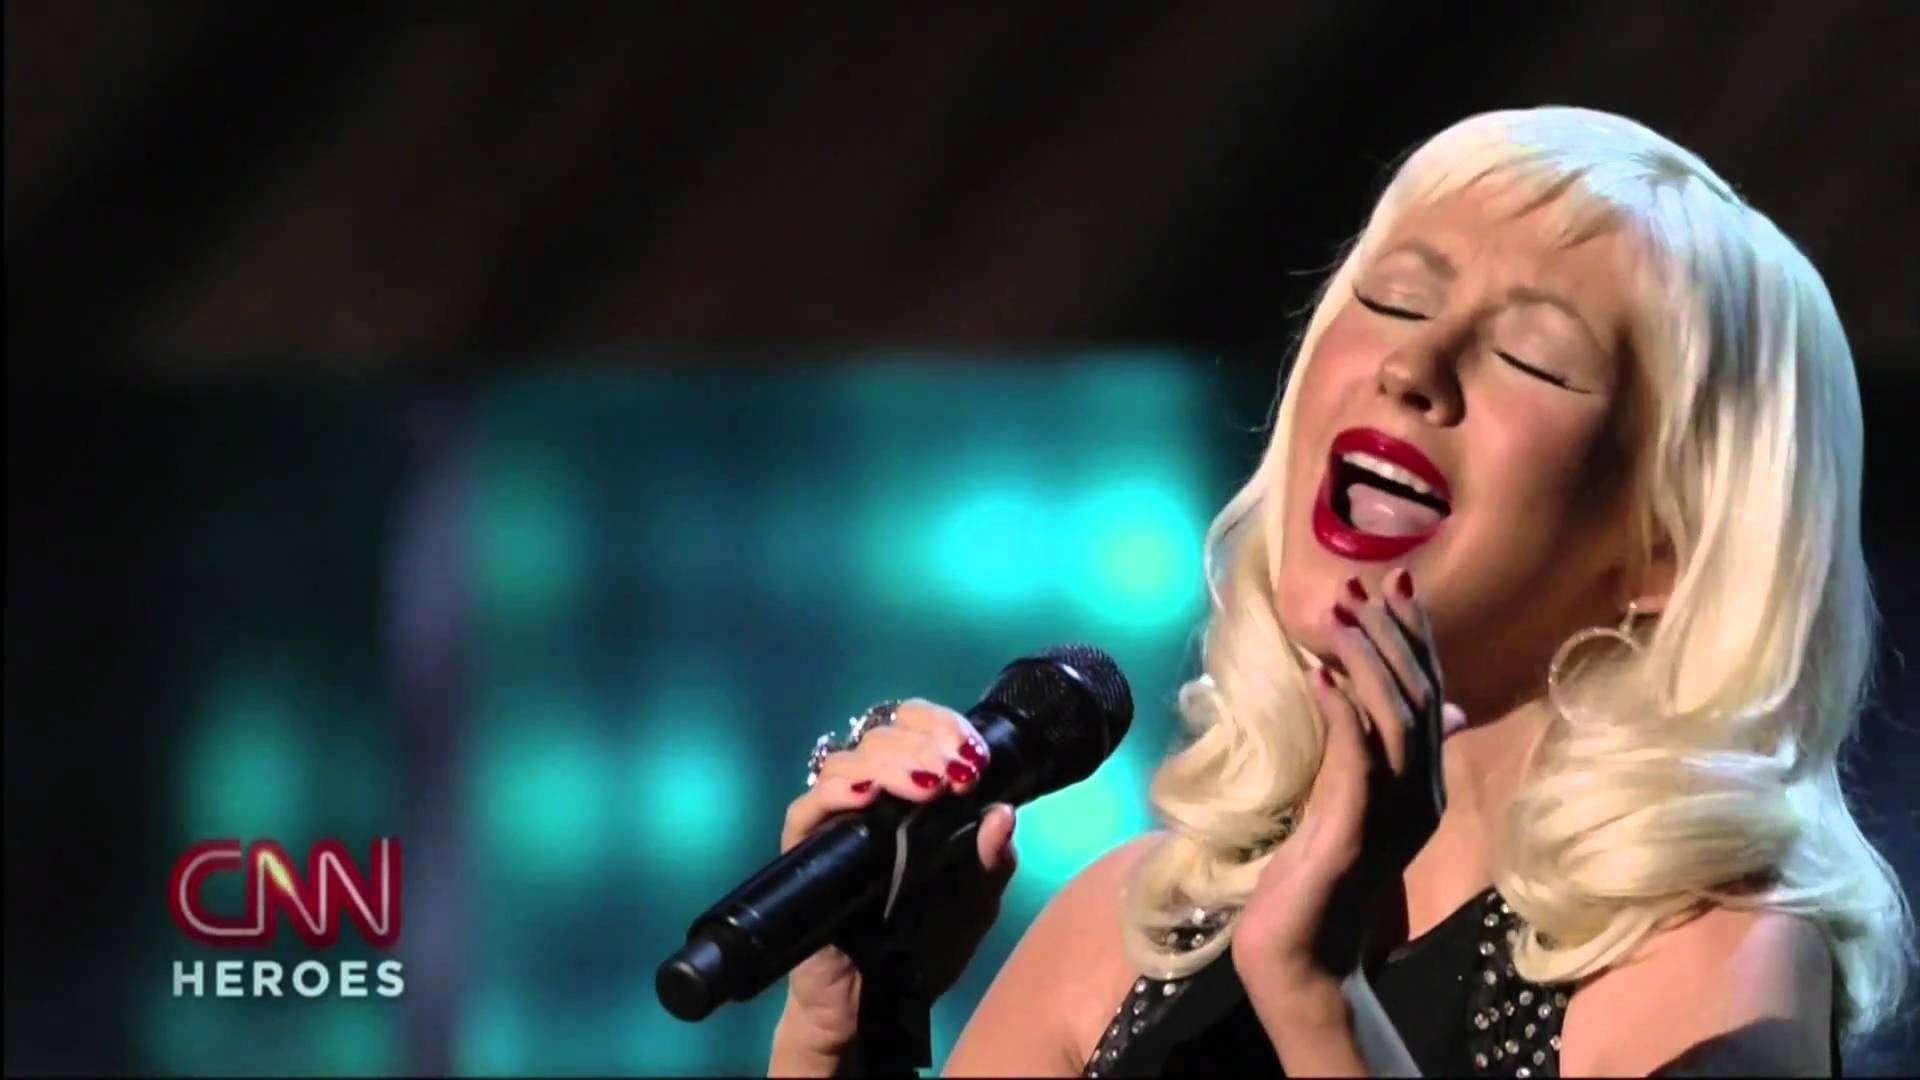 Christina Aguilera - Beautiful [Live] (CNN Heroes) High Definition - YouTube